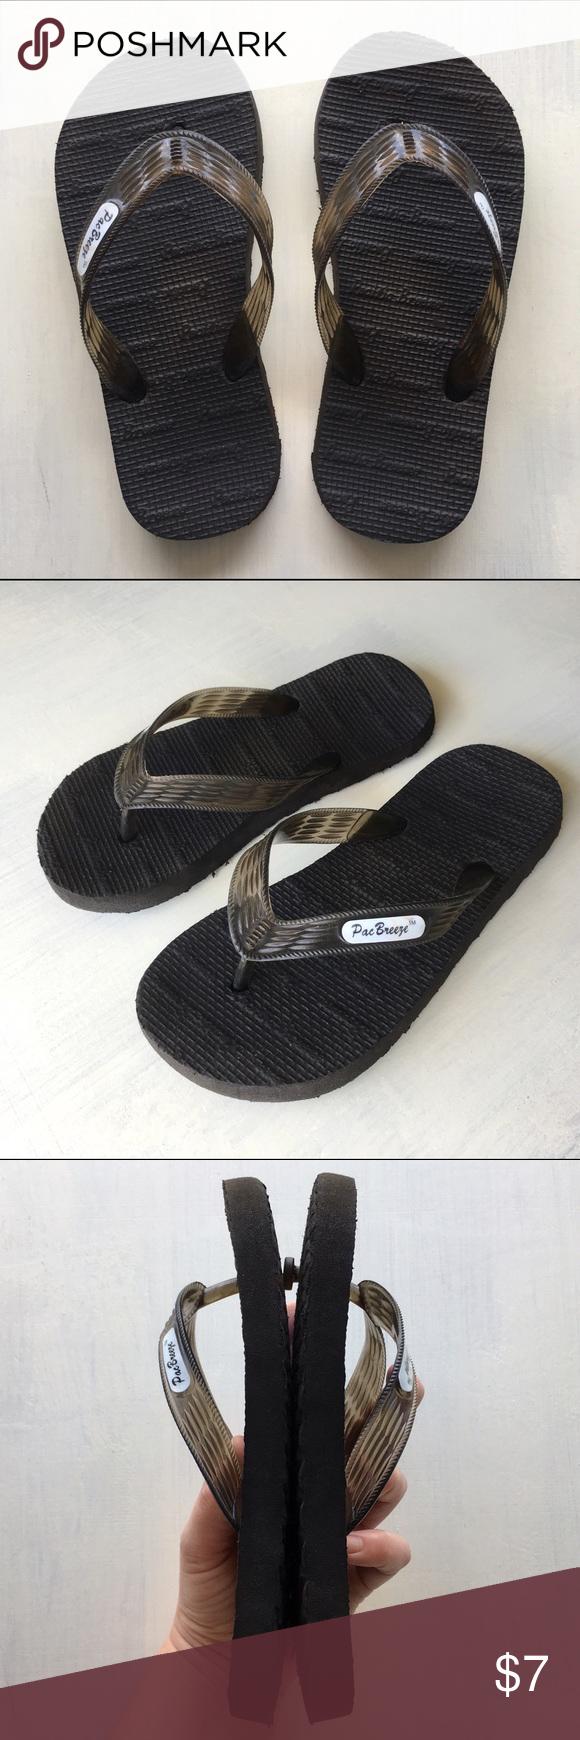 ec49f0ed1724 Hawaii Pac Breeze Women s Kid s Flip Flops Sandals Black Hawaiian Pacific  Breeze Locals Slippers!